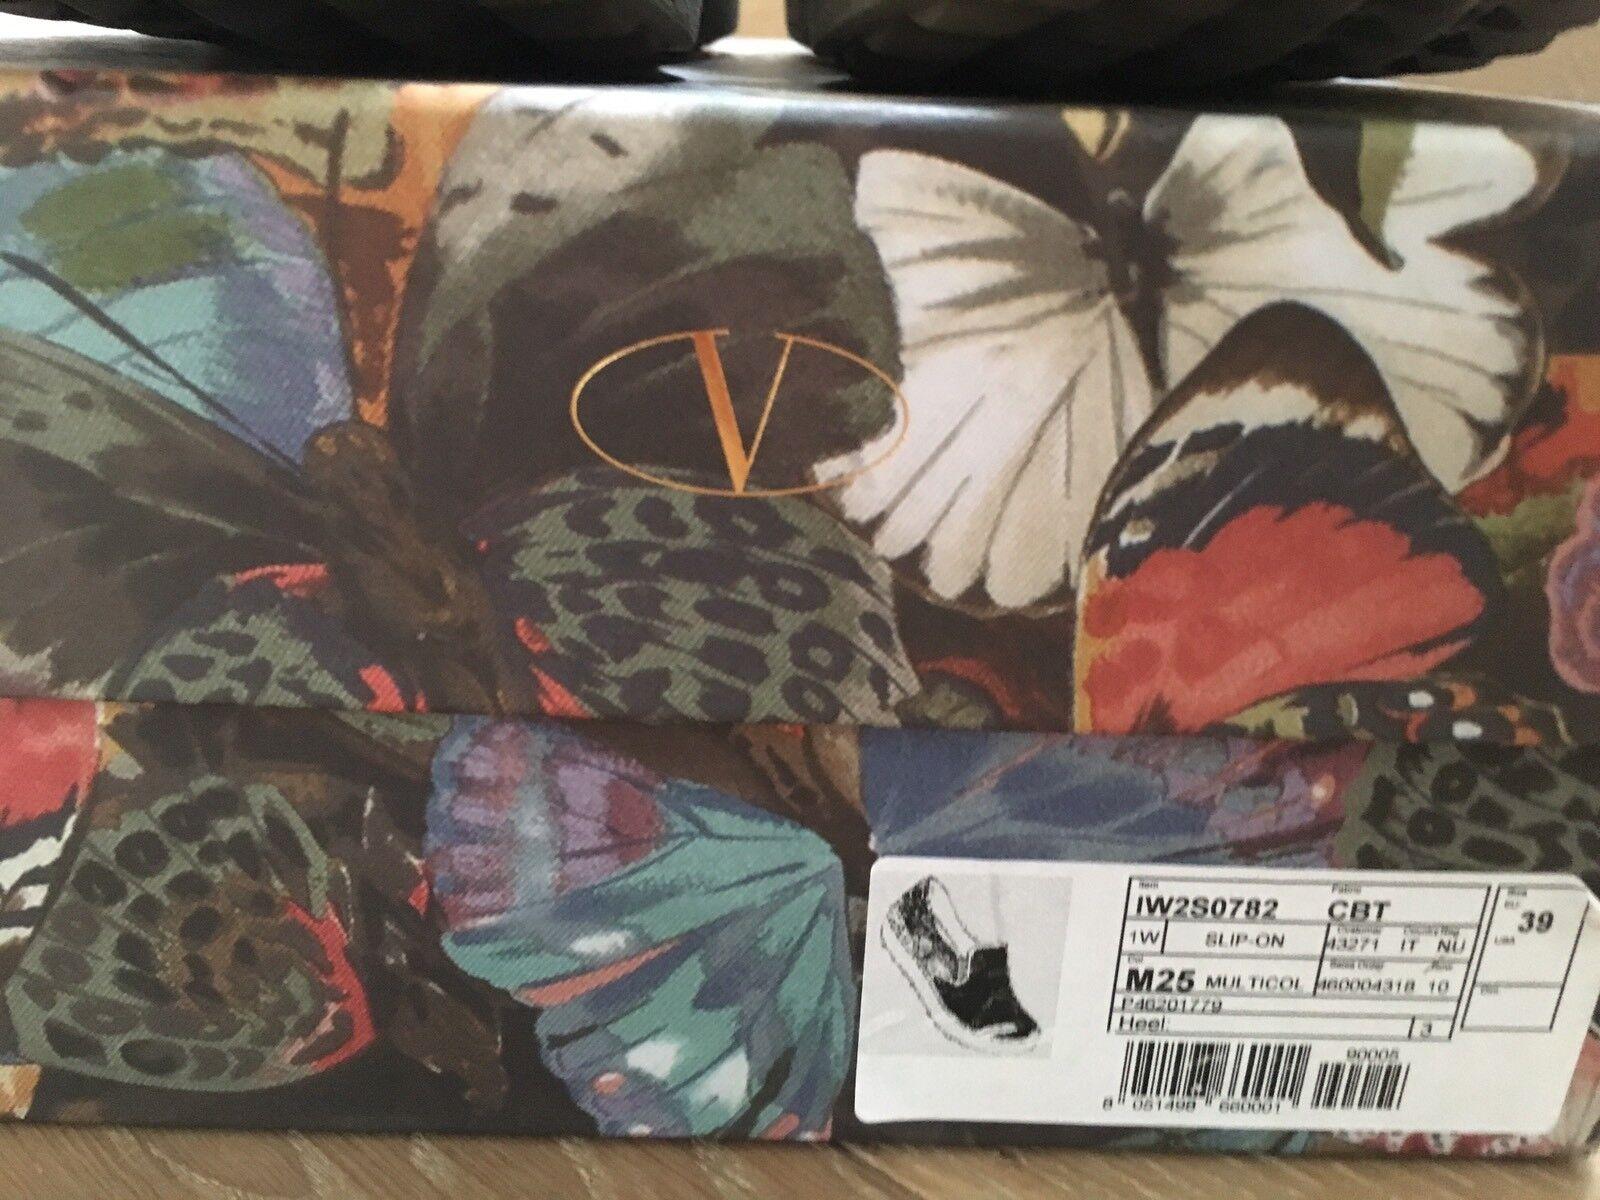 Original Valentino Turnschuhe Schuhe Slip on 39 oliv bunt Butterfly Karton